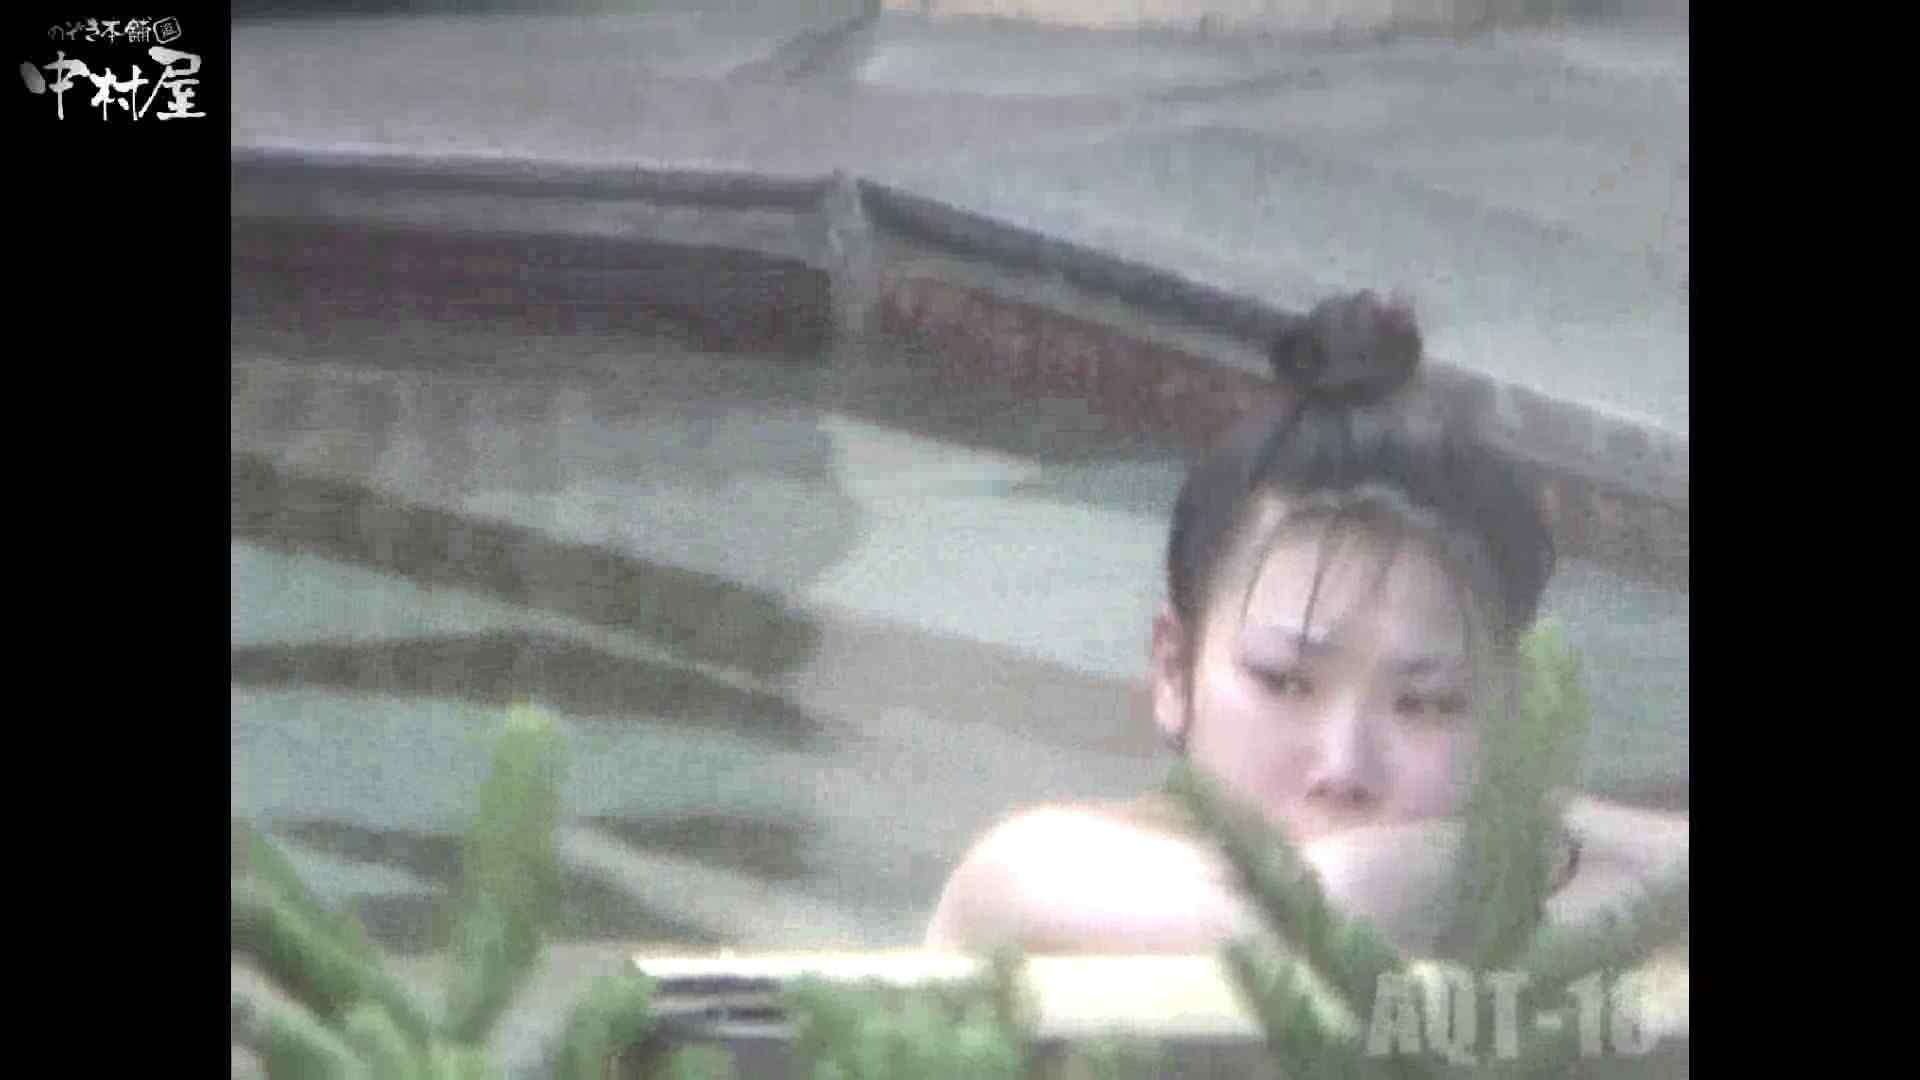 Aquaな露天風呂Vol.882潜入盗撮露天風呂十八判湯 其の二 潜入 おめこ無修正動画無料 90画像 87